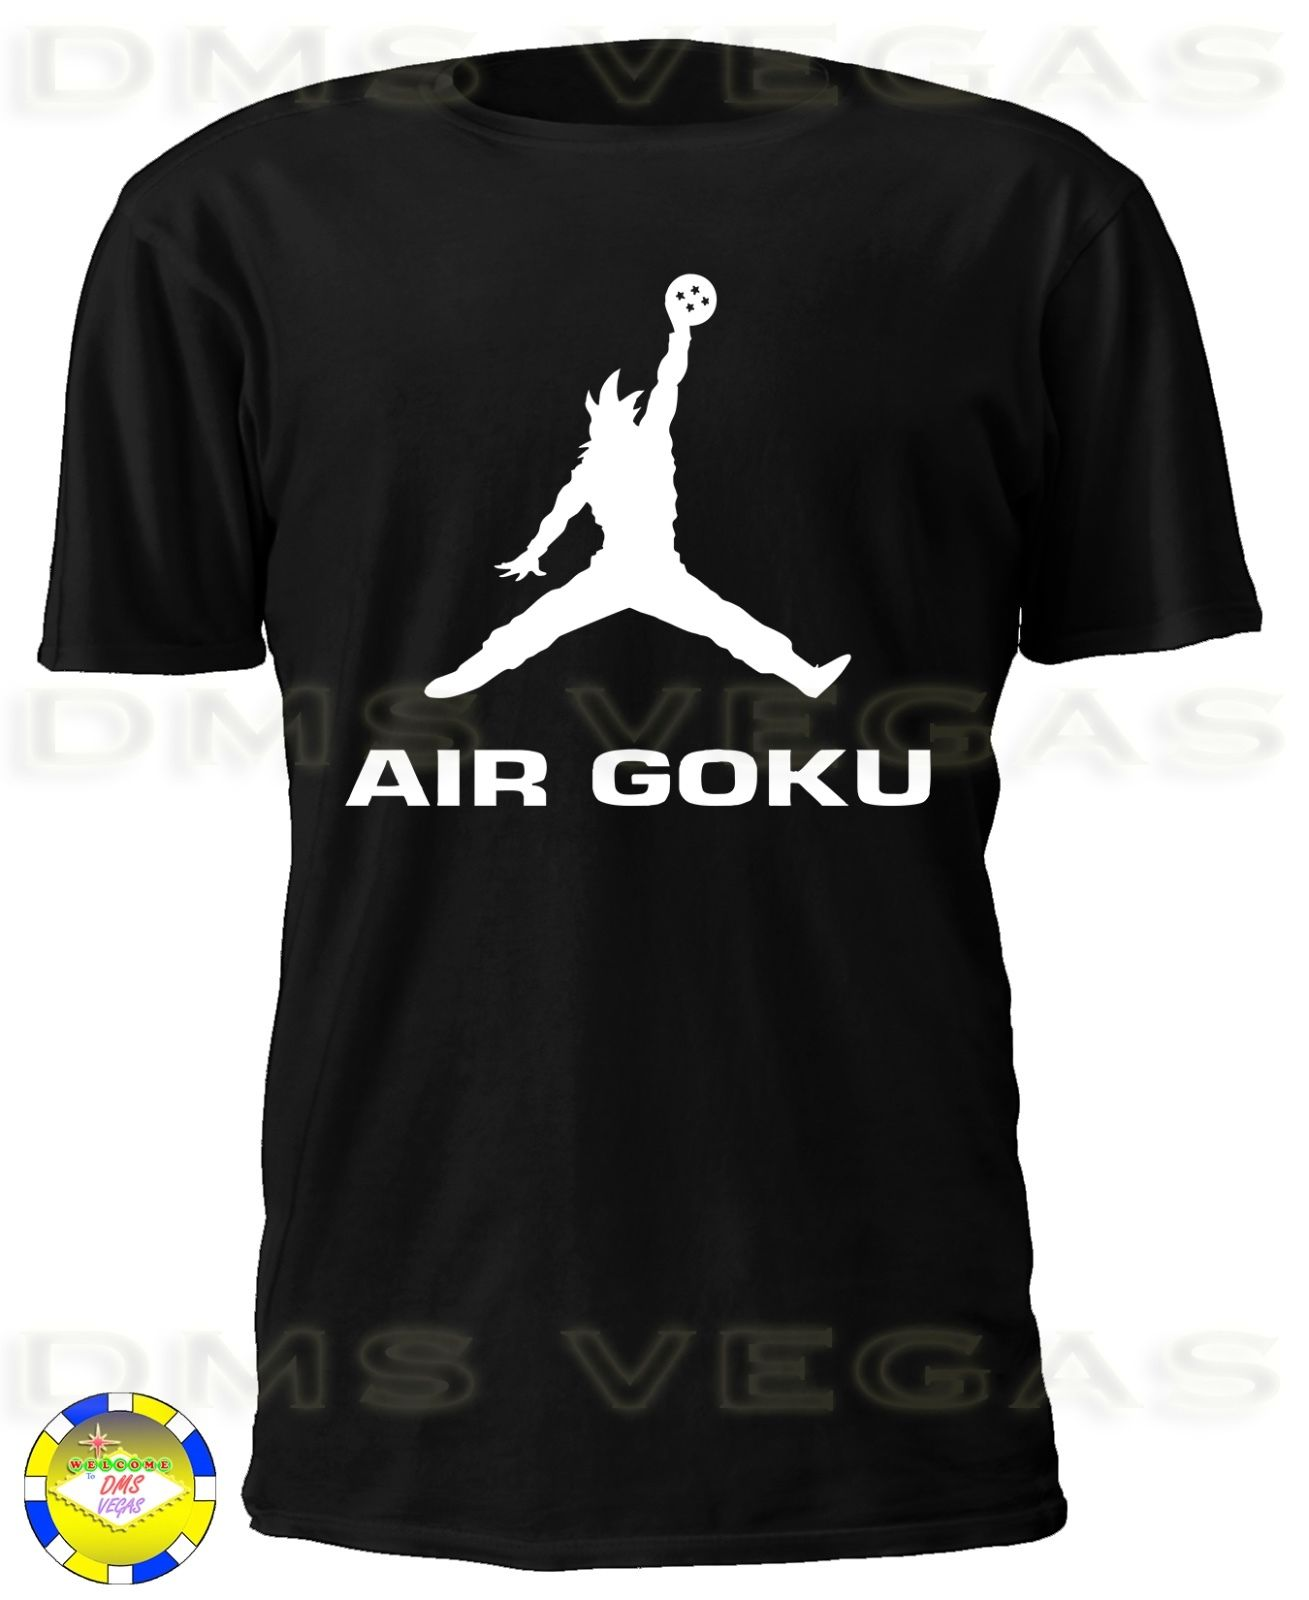 Dragon Ball Z Air Goku Parody Funny Humor Cool Tee Shirt Men Free shipping tshirt Harajuku Fashion Classic Unique T Shirt in T Shirts from Men 39 s Clothing